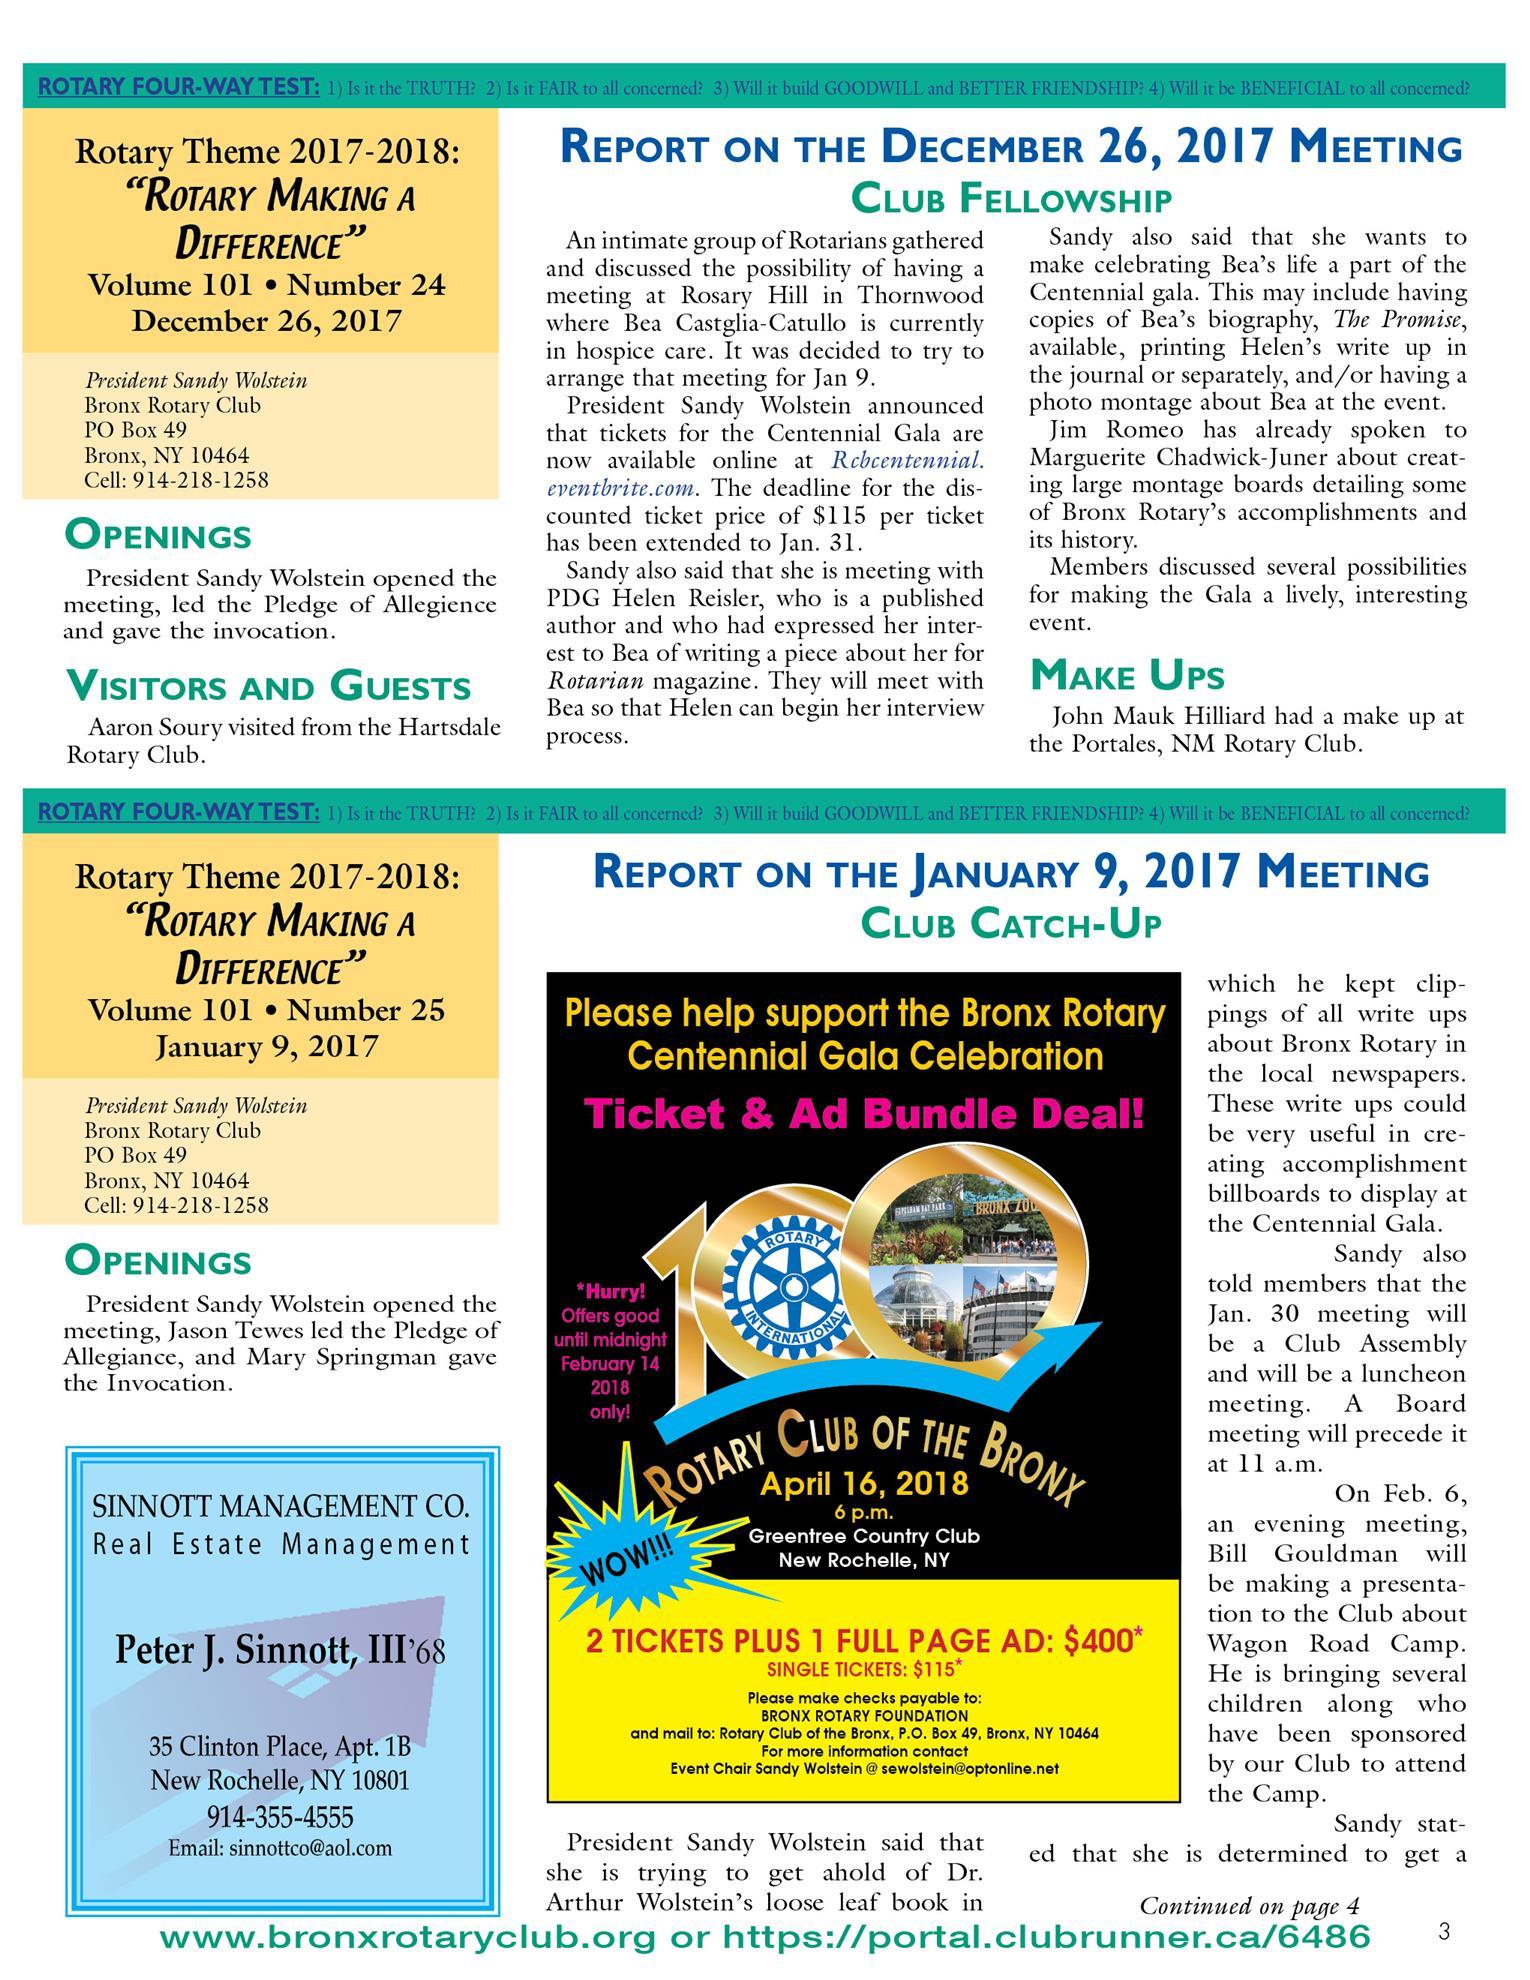 Tuesdays Newsletter 12/19 & 12/26/17 & 1/9/18 p3